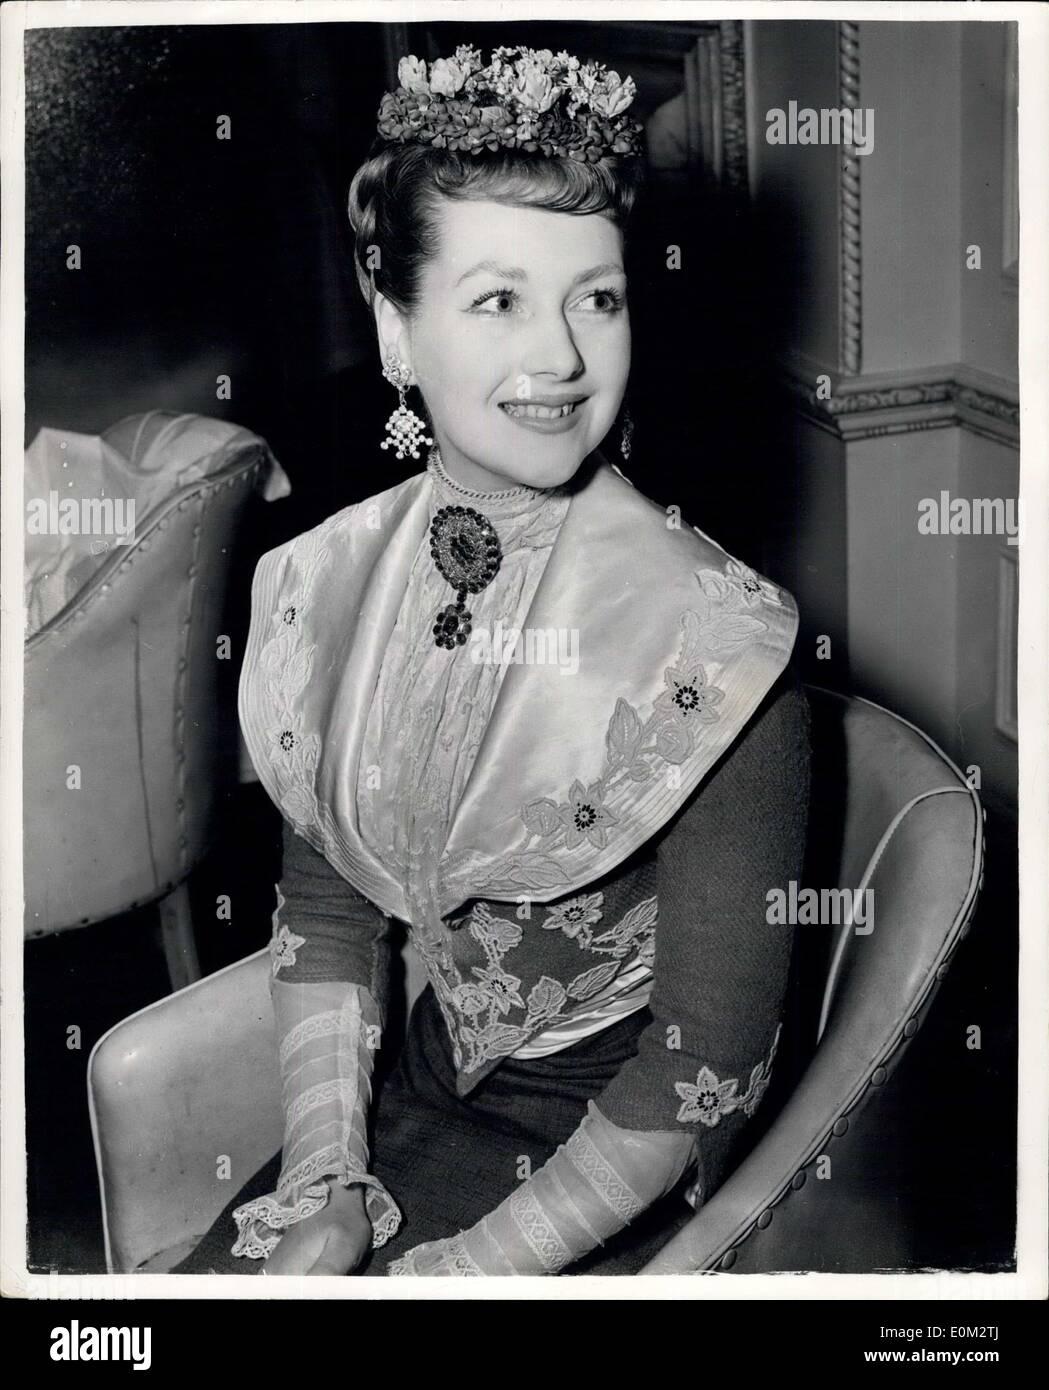 14 Mai 1953 The Hon Mrs Gerald Legge Hat Eine Spezielle Frisur 19